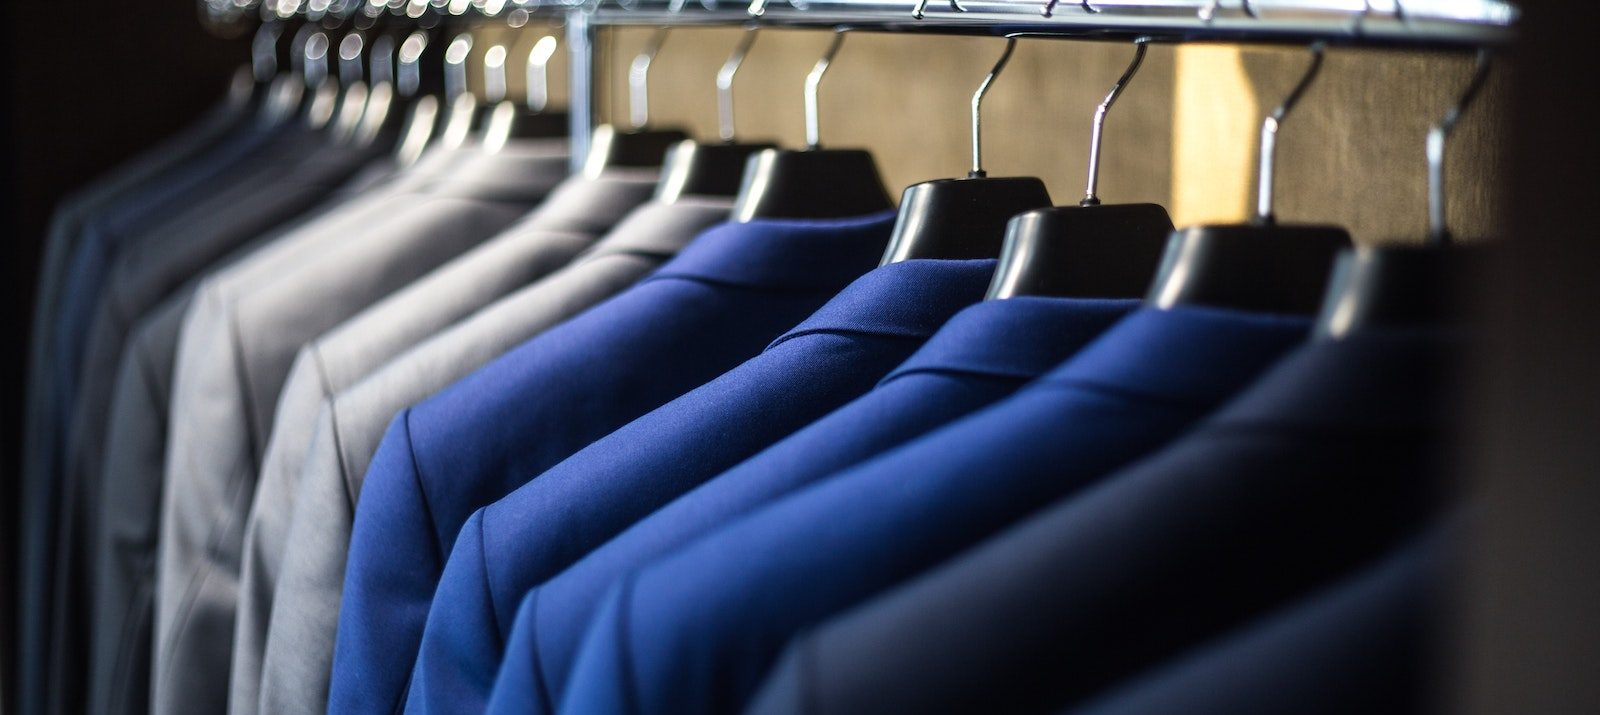 blue-suit-jackets-hanging-1600x715.jpg